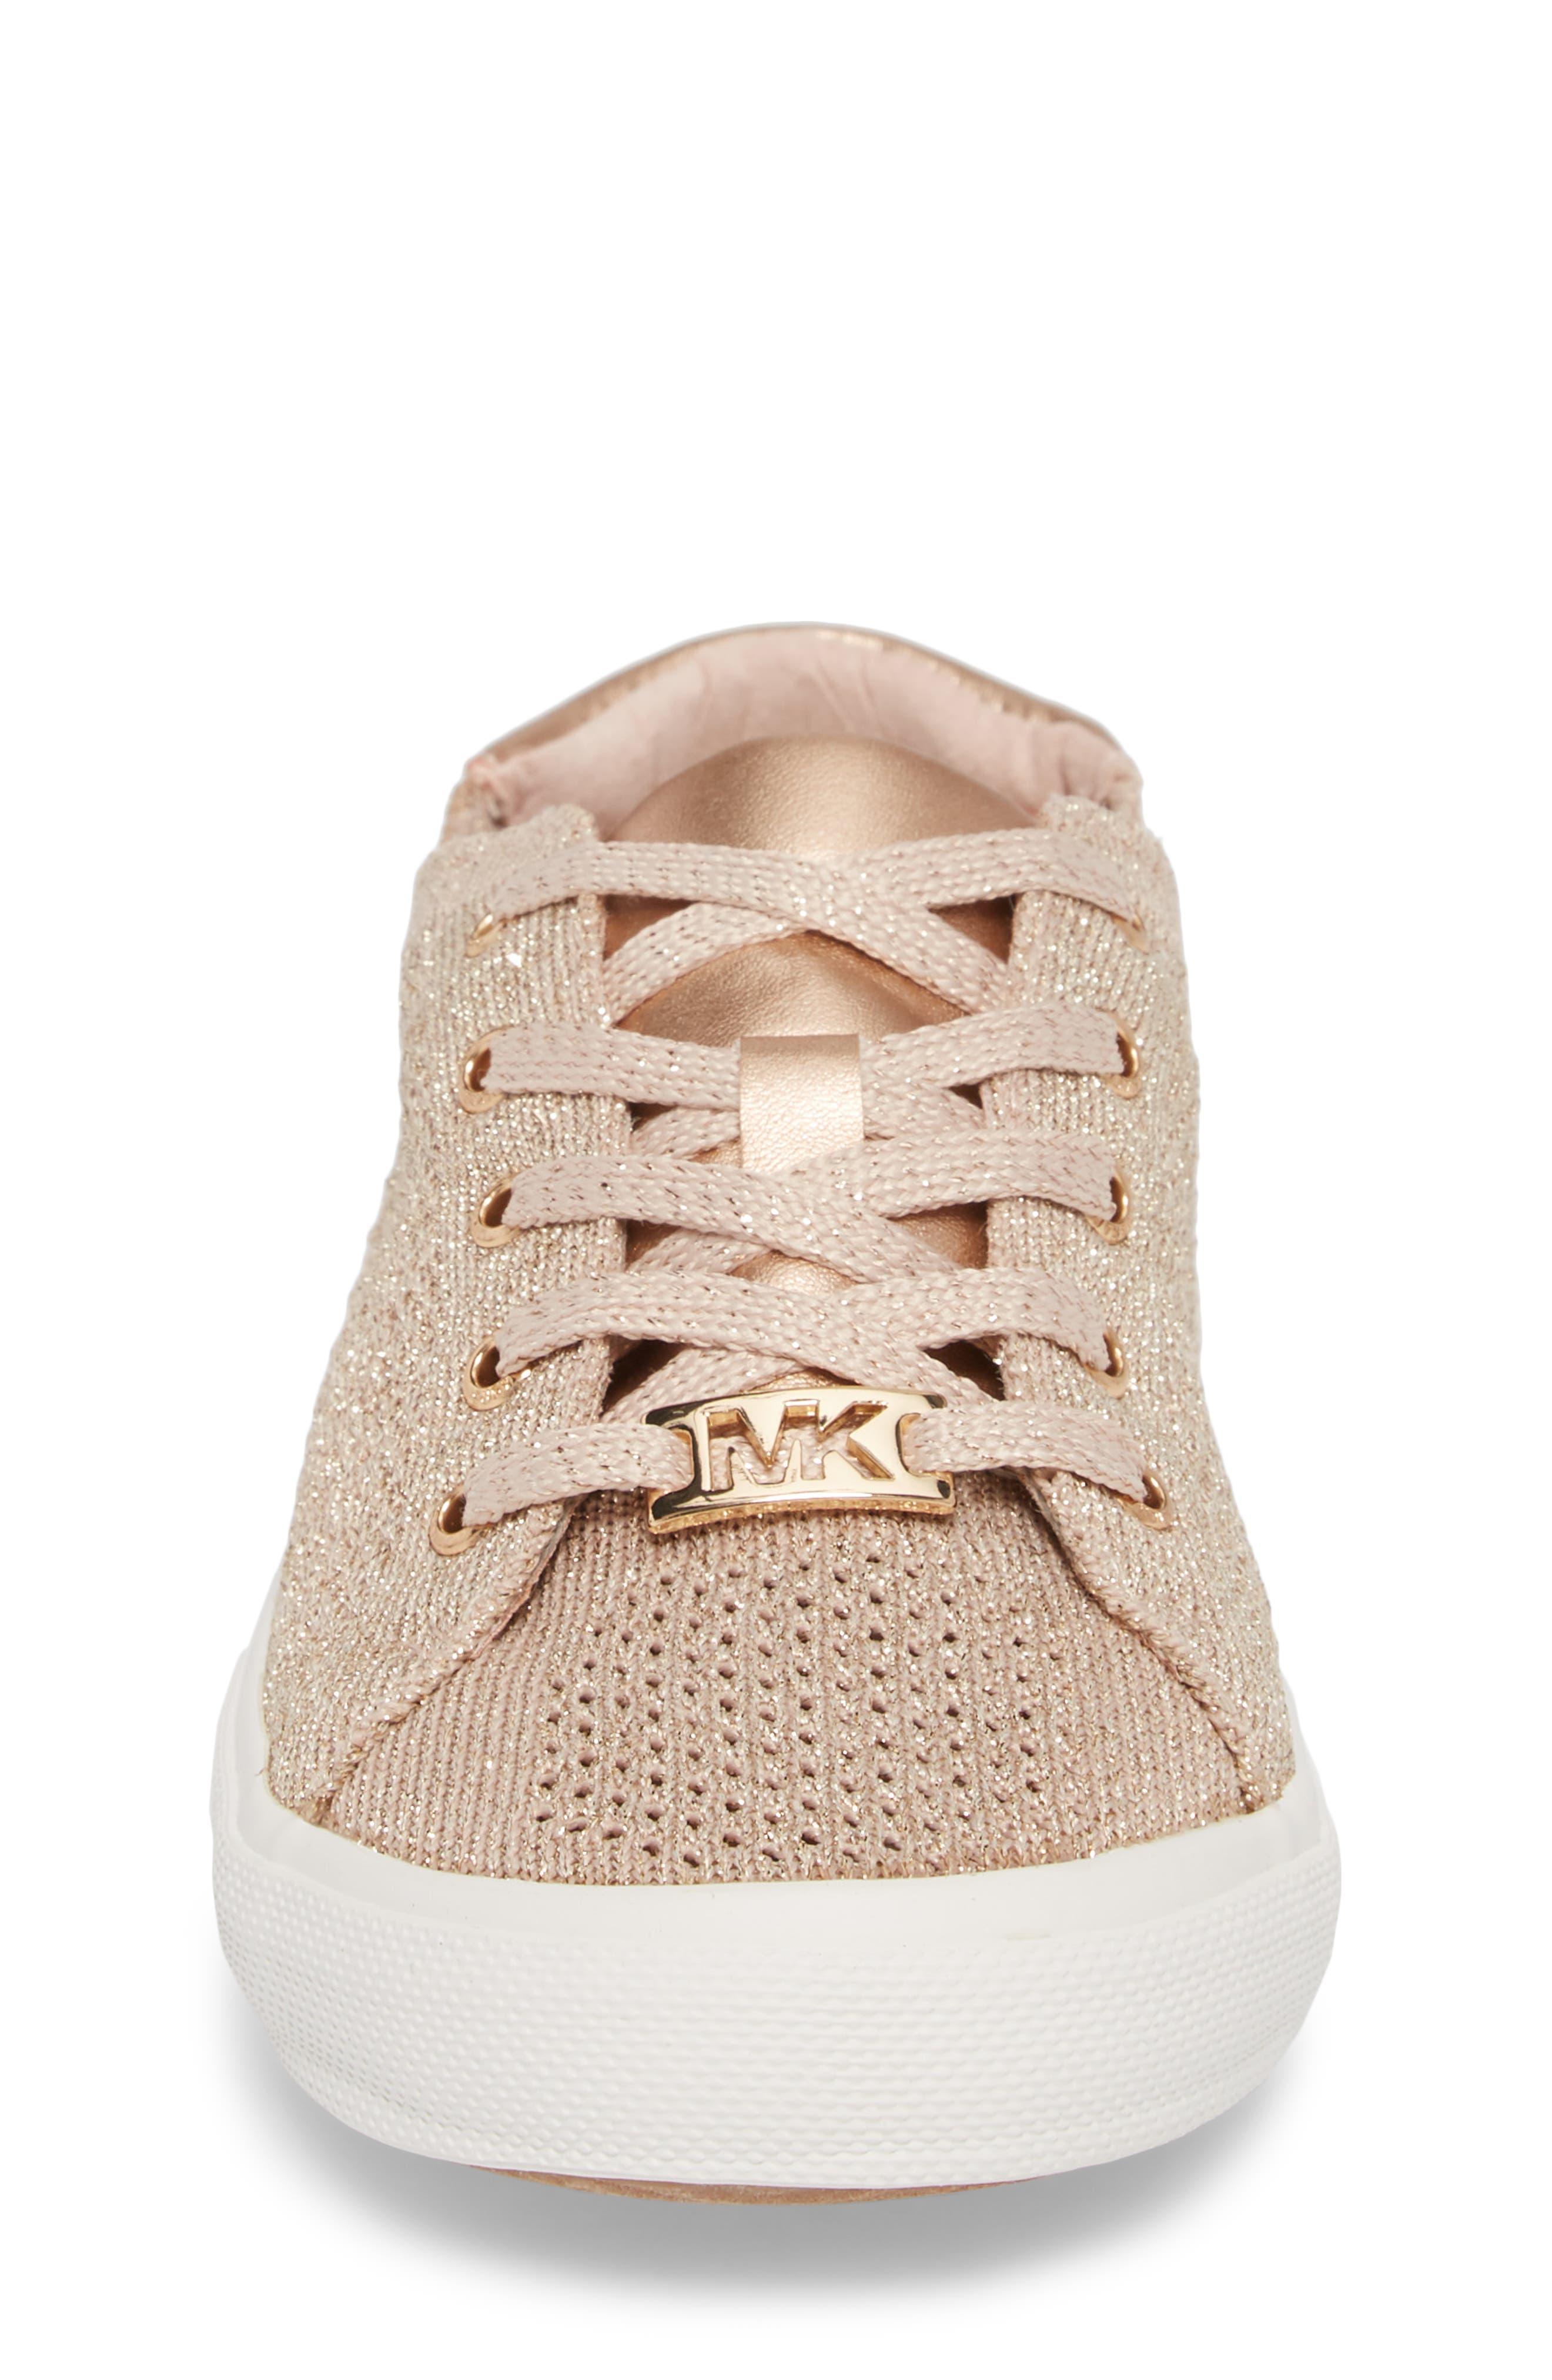 Ima Metallic Knit Sneaker,                             Alternate thumbnail 4, color,                             BLUSH SHIMMER